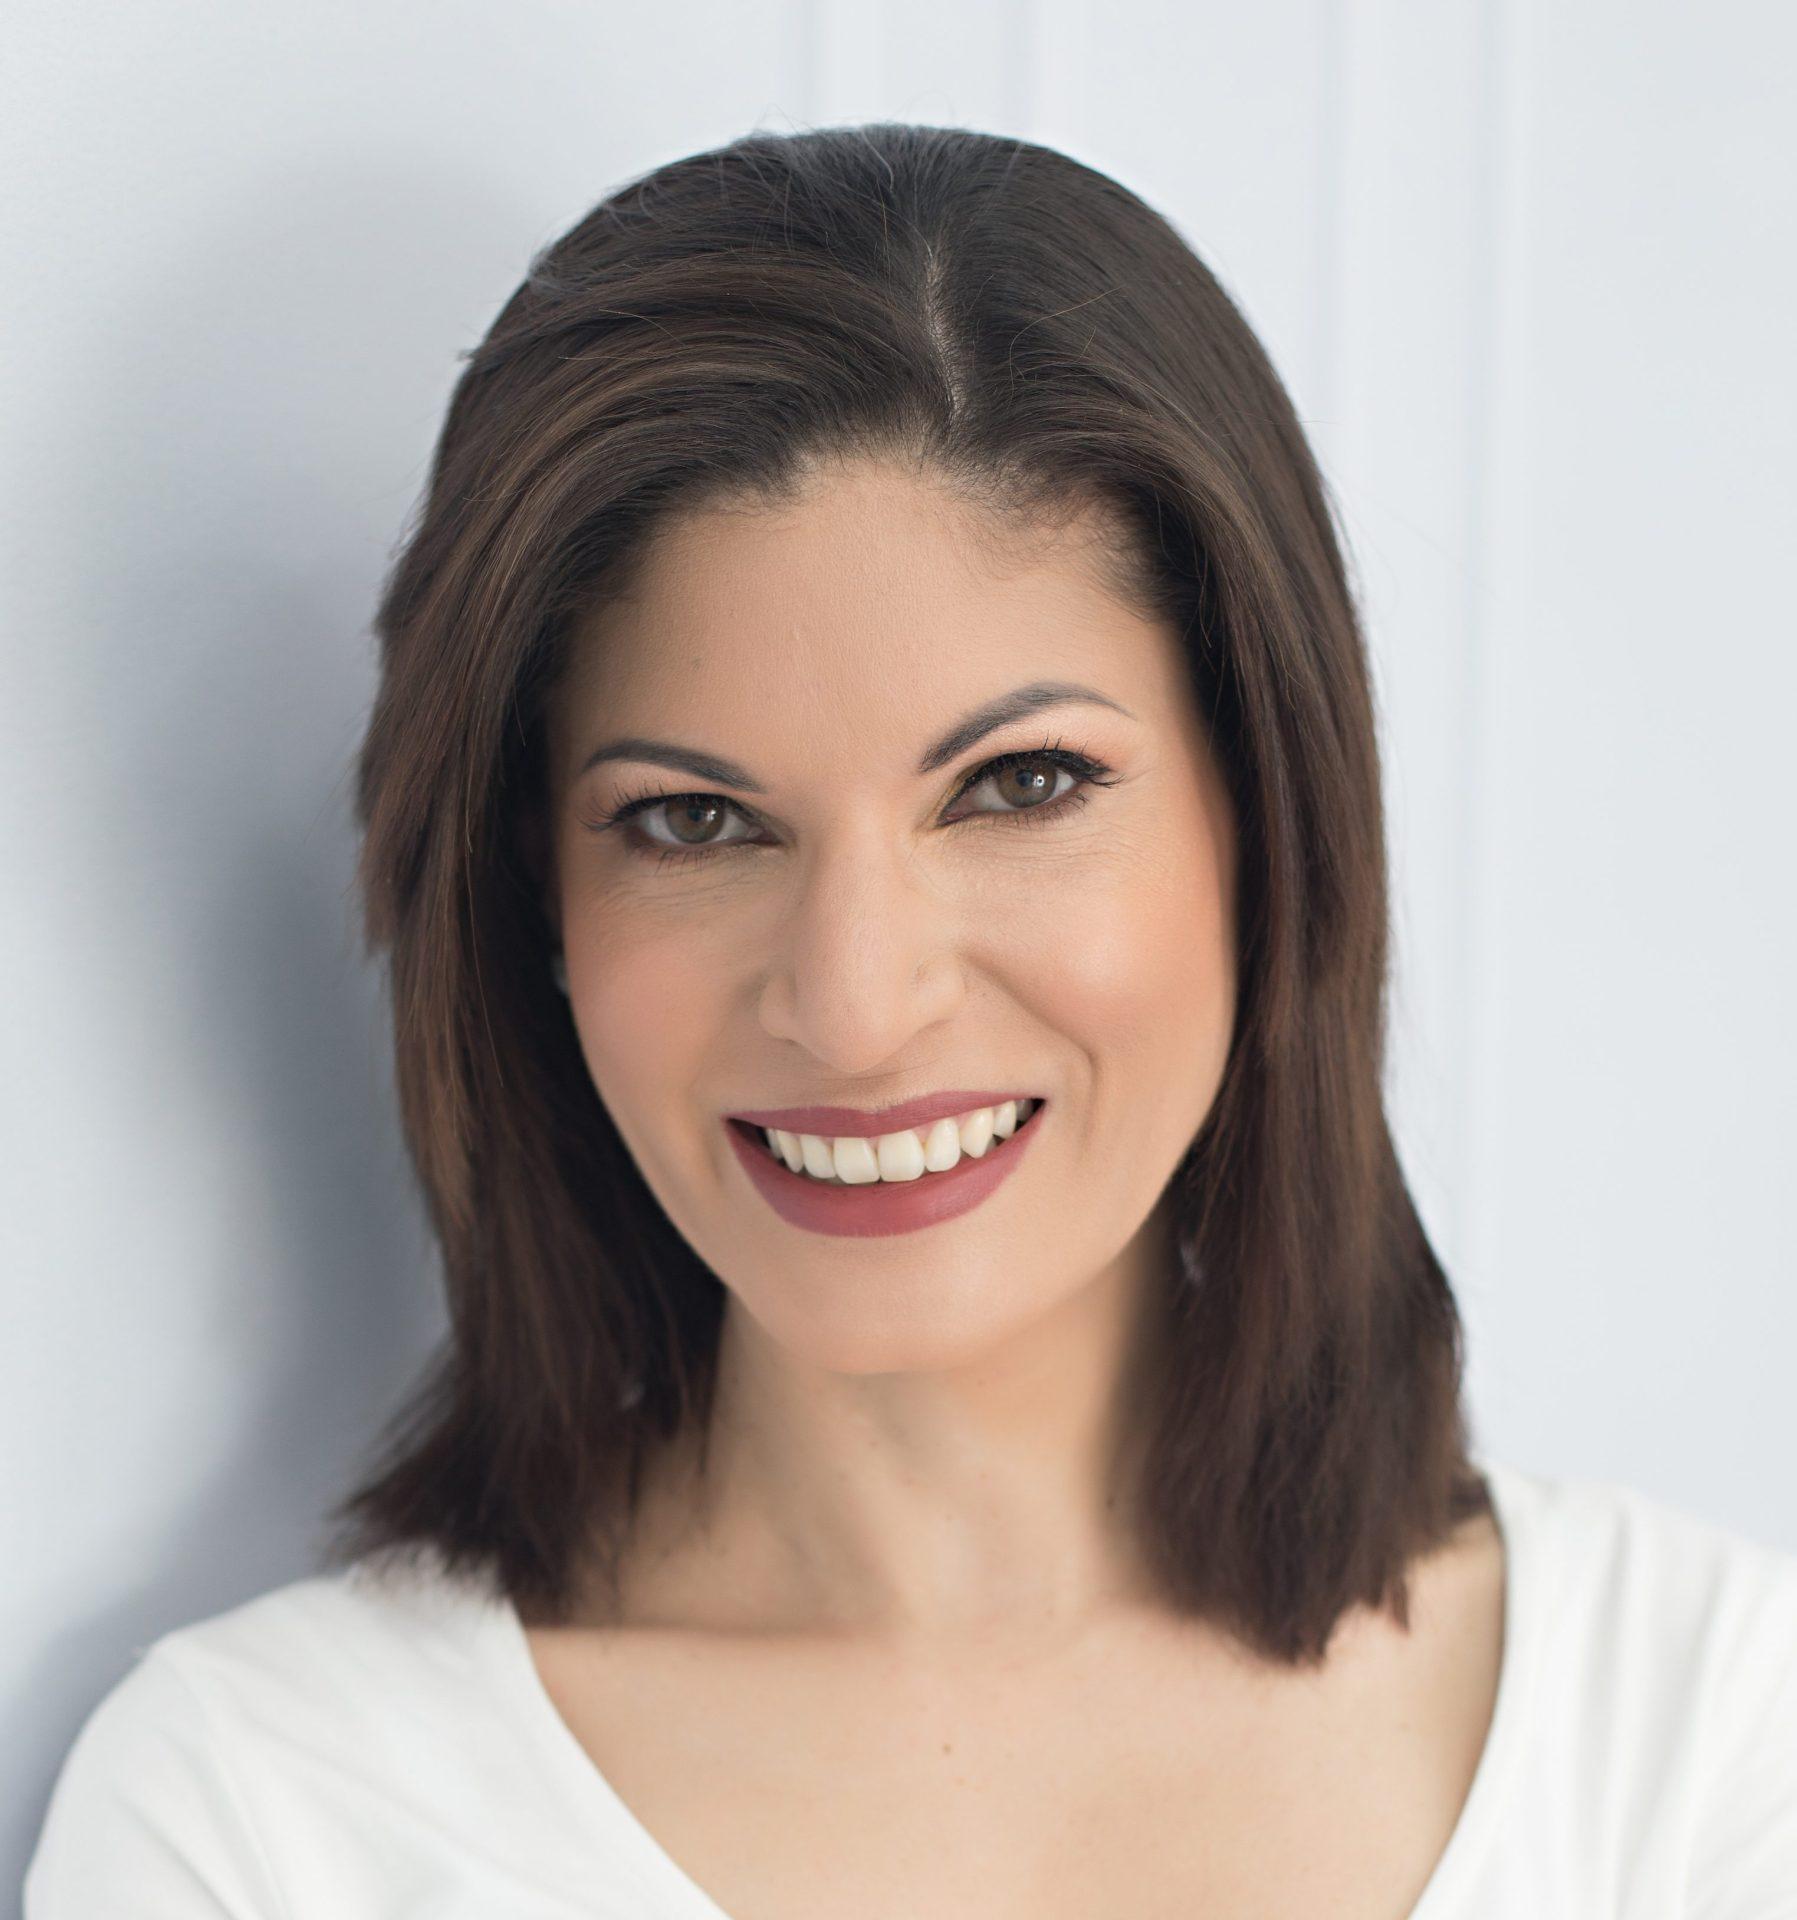 María Montero